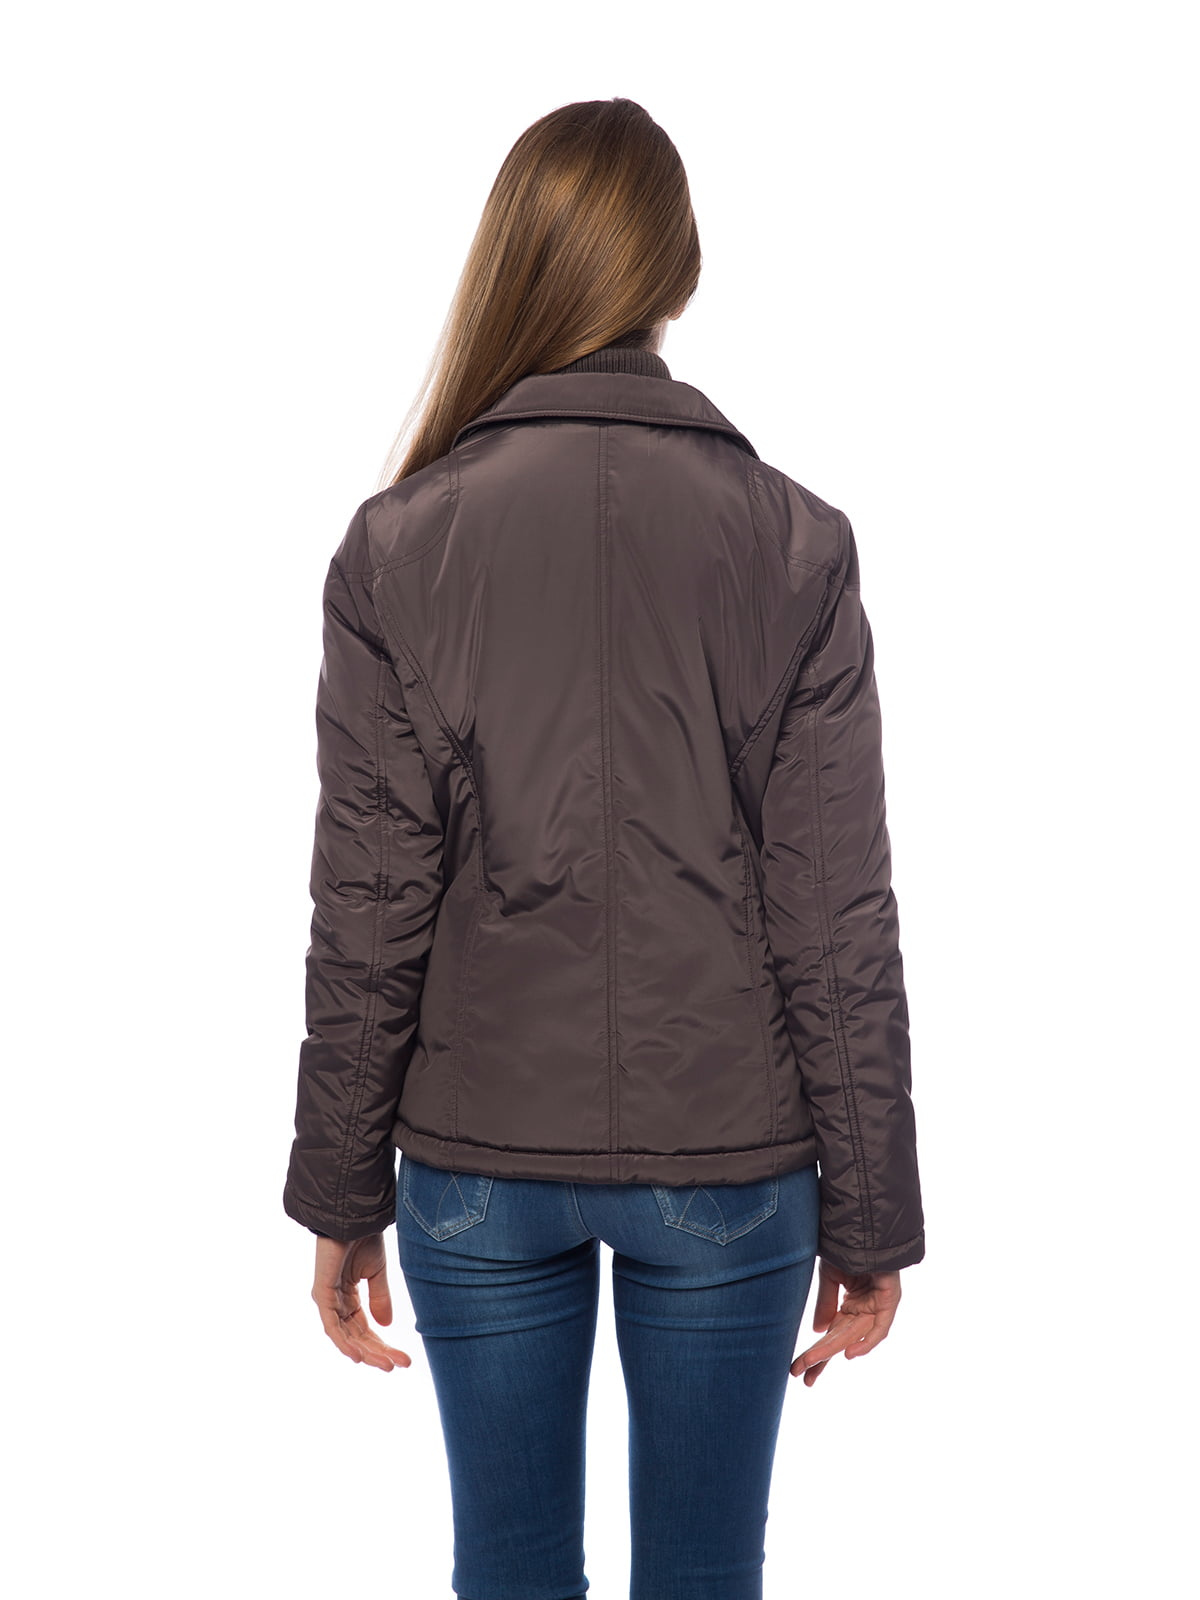 Куртка коричневая | 2716680 | фото 8